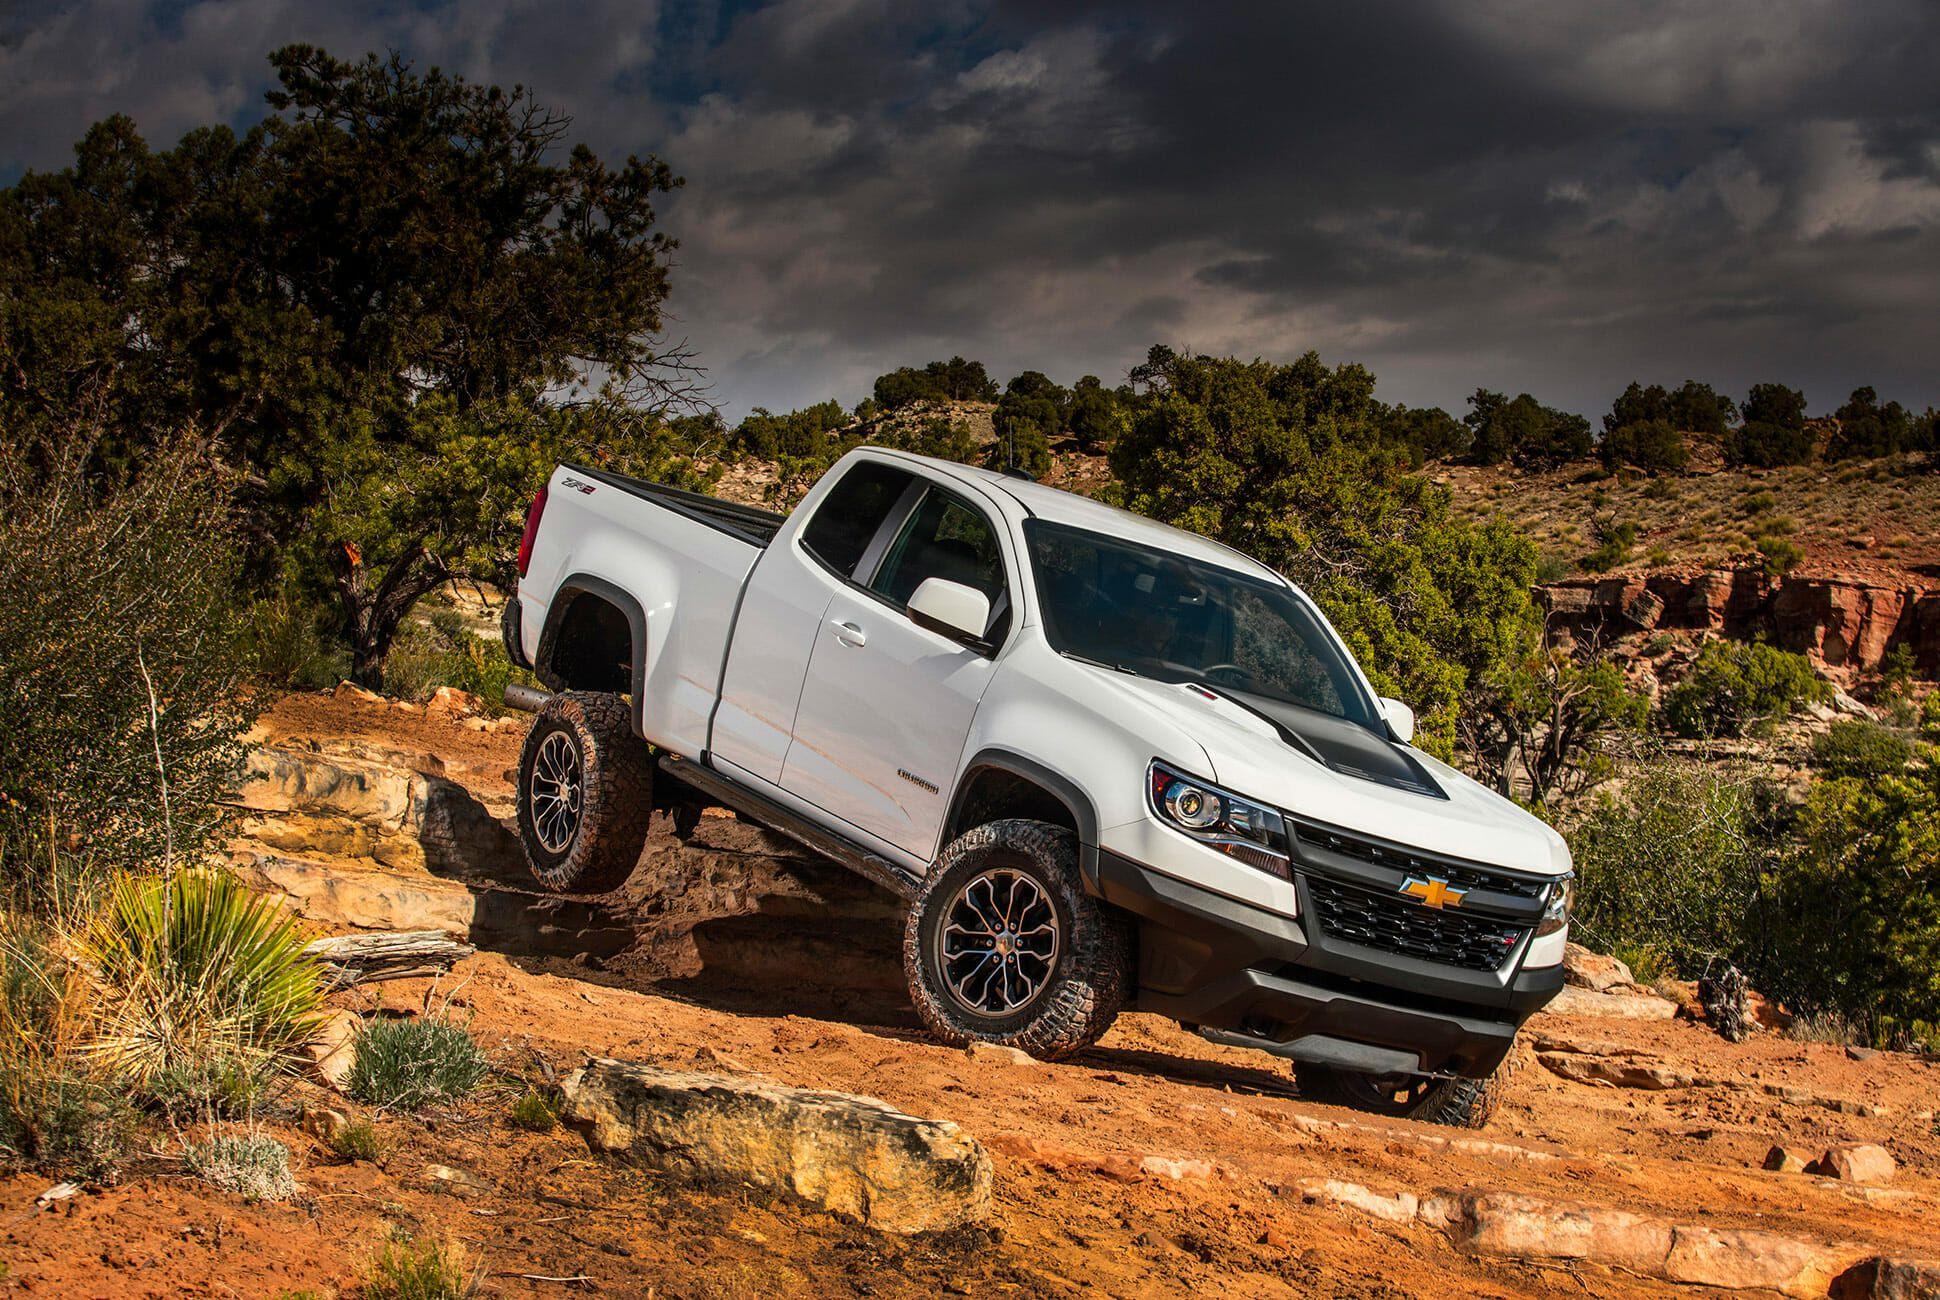 Chevy-Colorado-ZR2-Review-Gear-Patrol-Slide-2